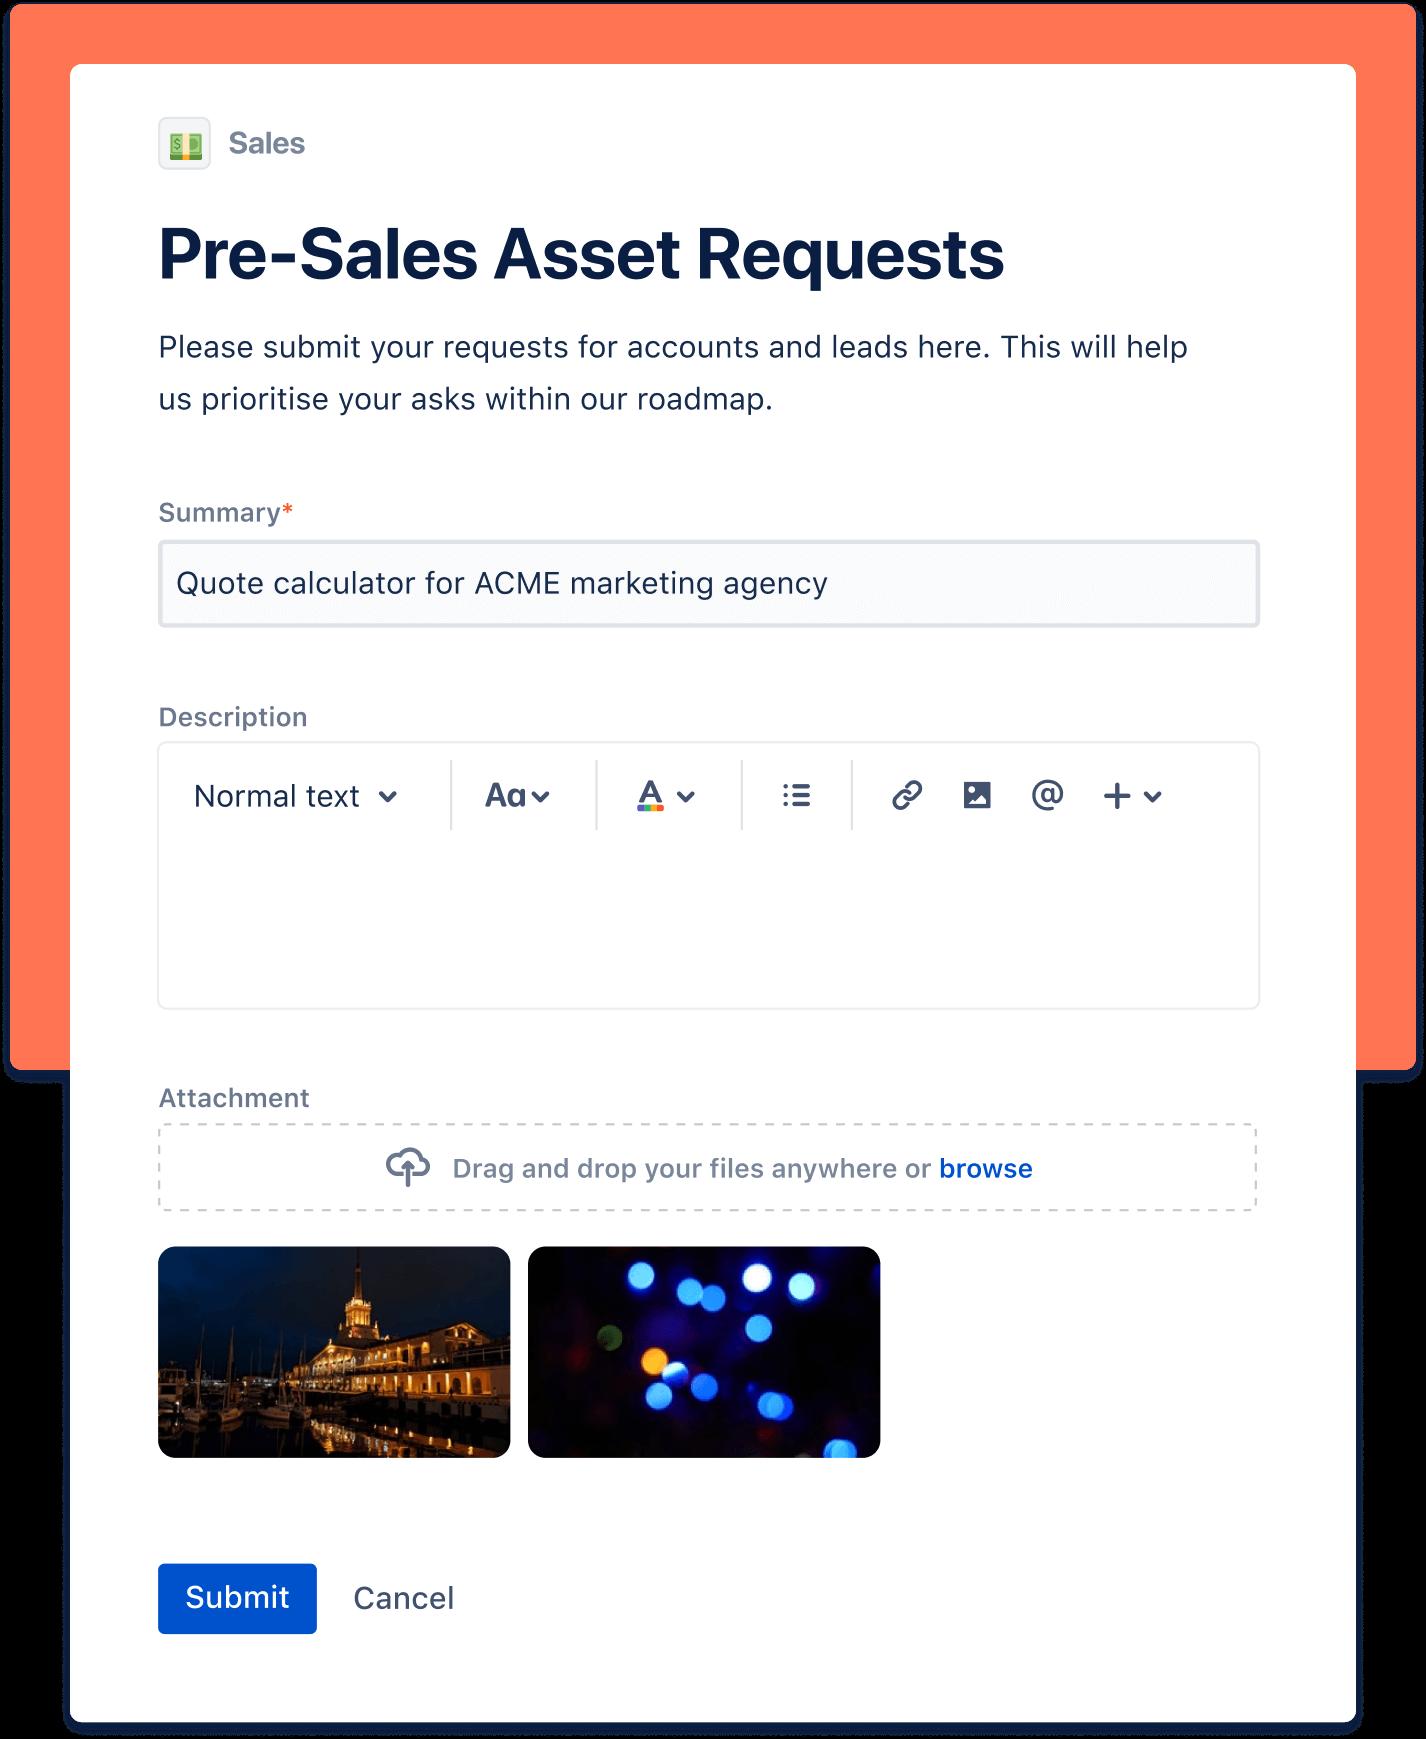 Pre-sales asset request screenshot